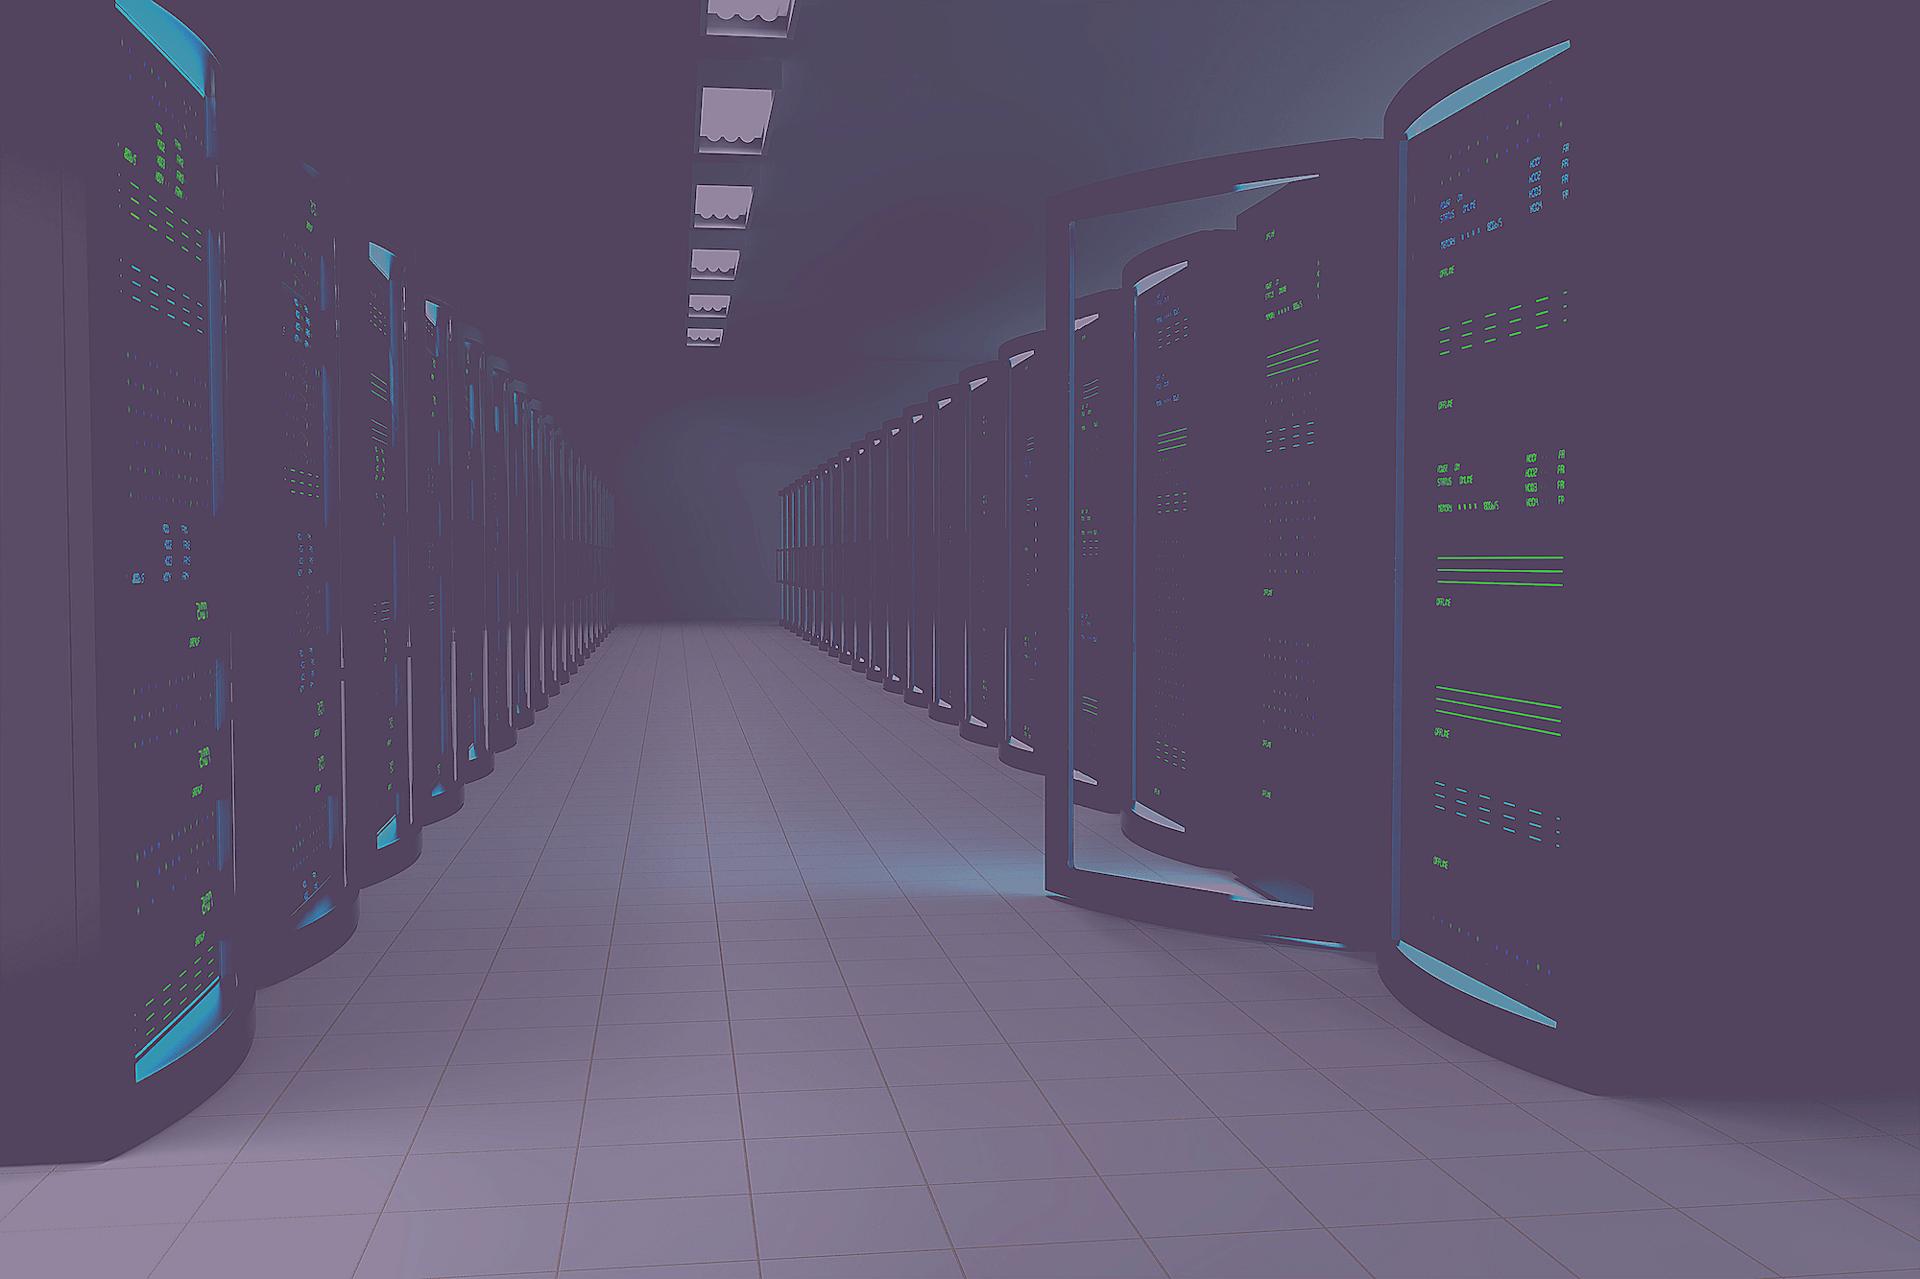 Server room